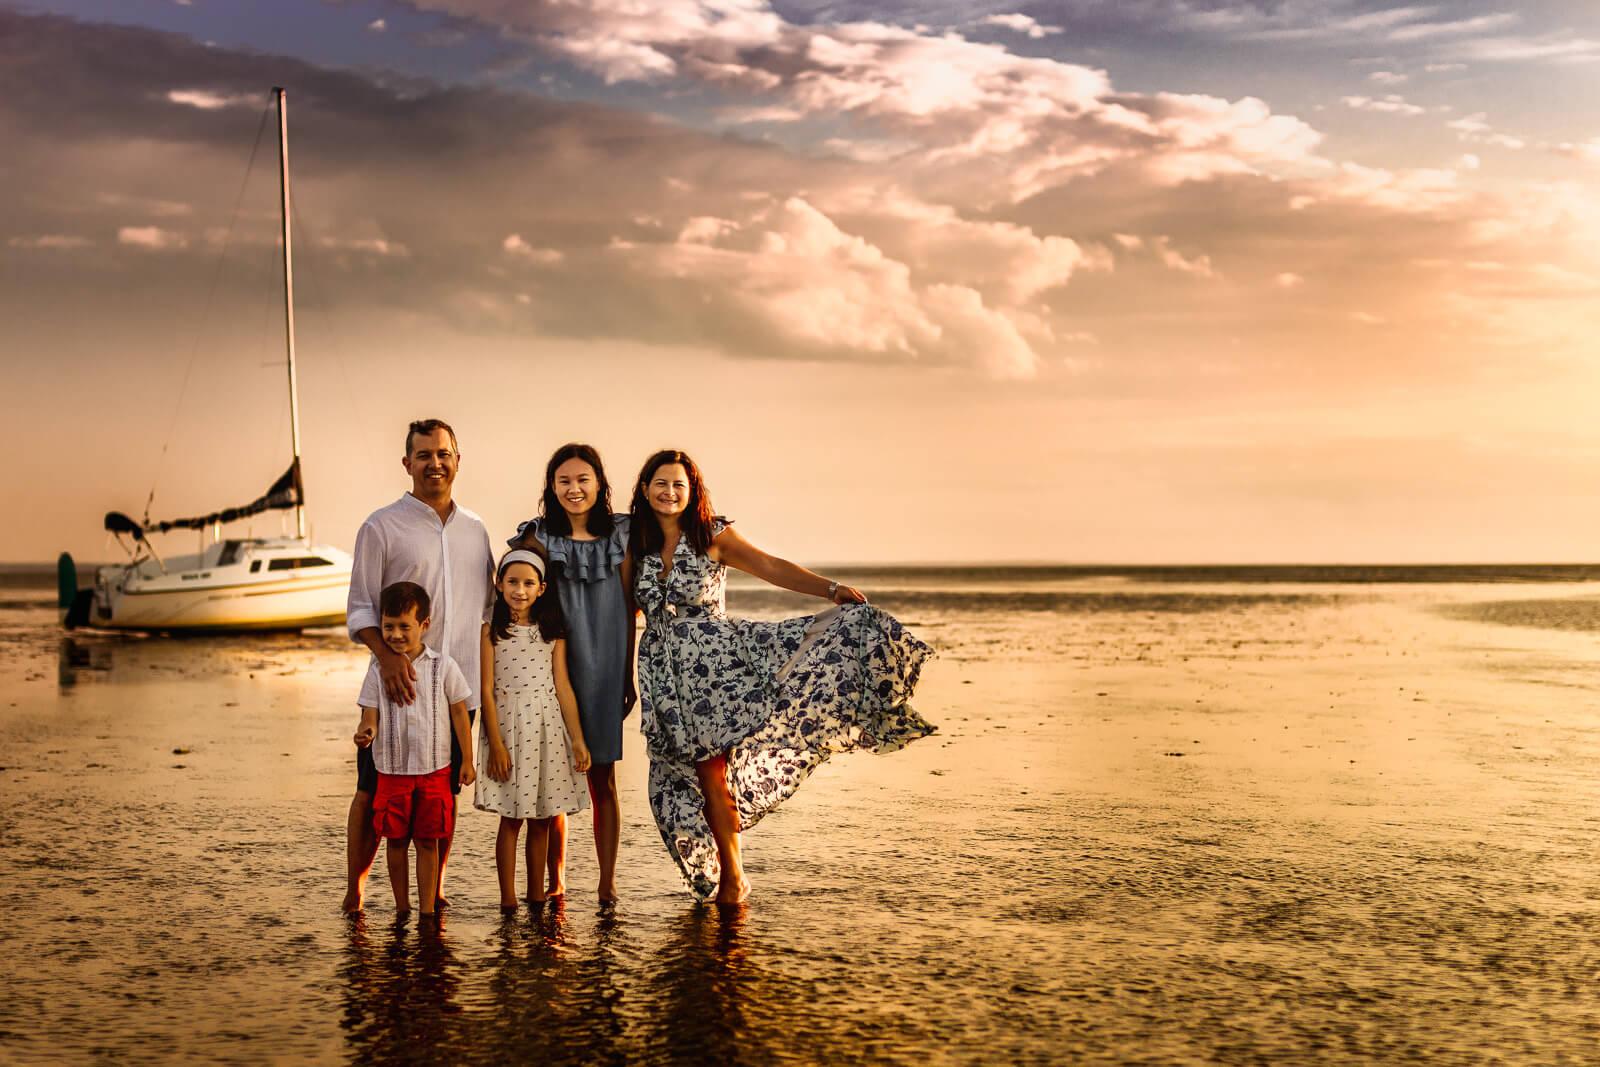 Cape Cod Beach Family Photo Session -19-1